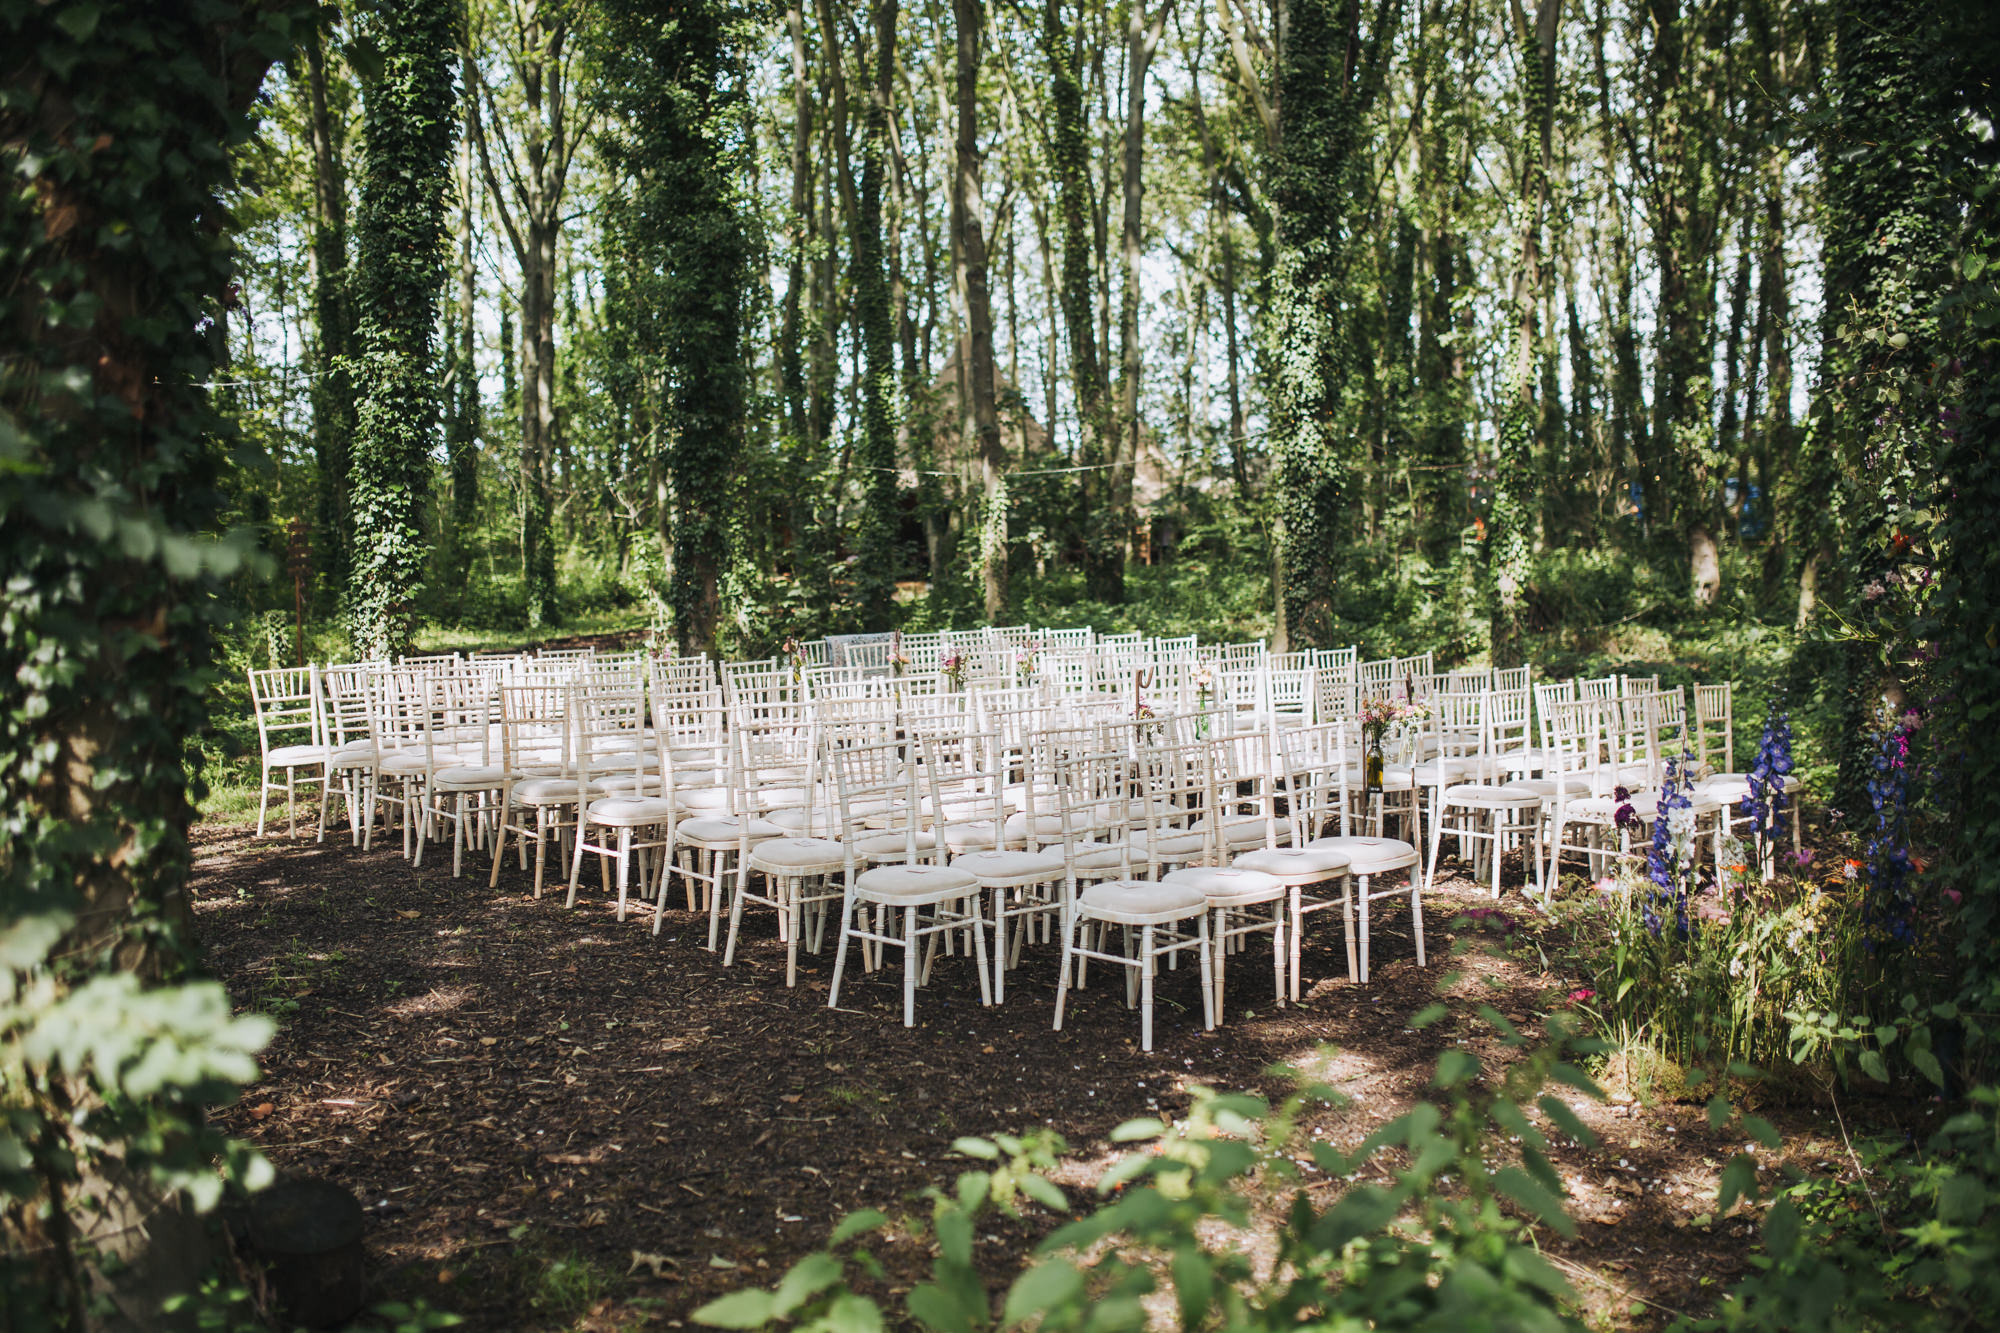 applewood wedding photographer leeds, yorkshire15.jpg